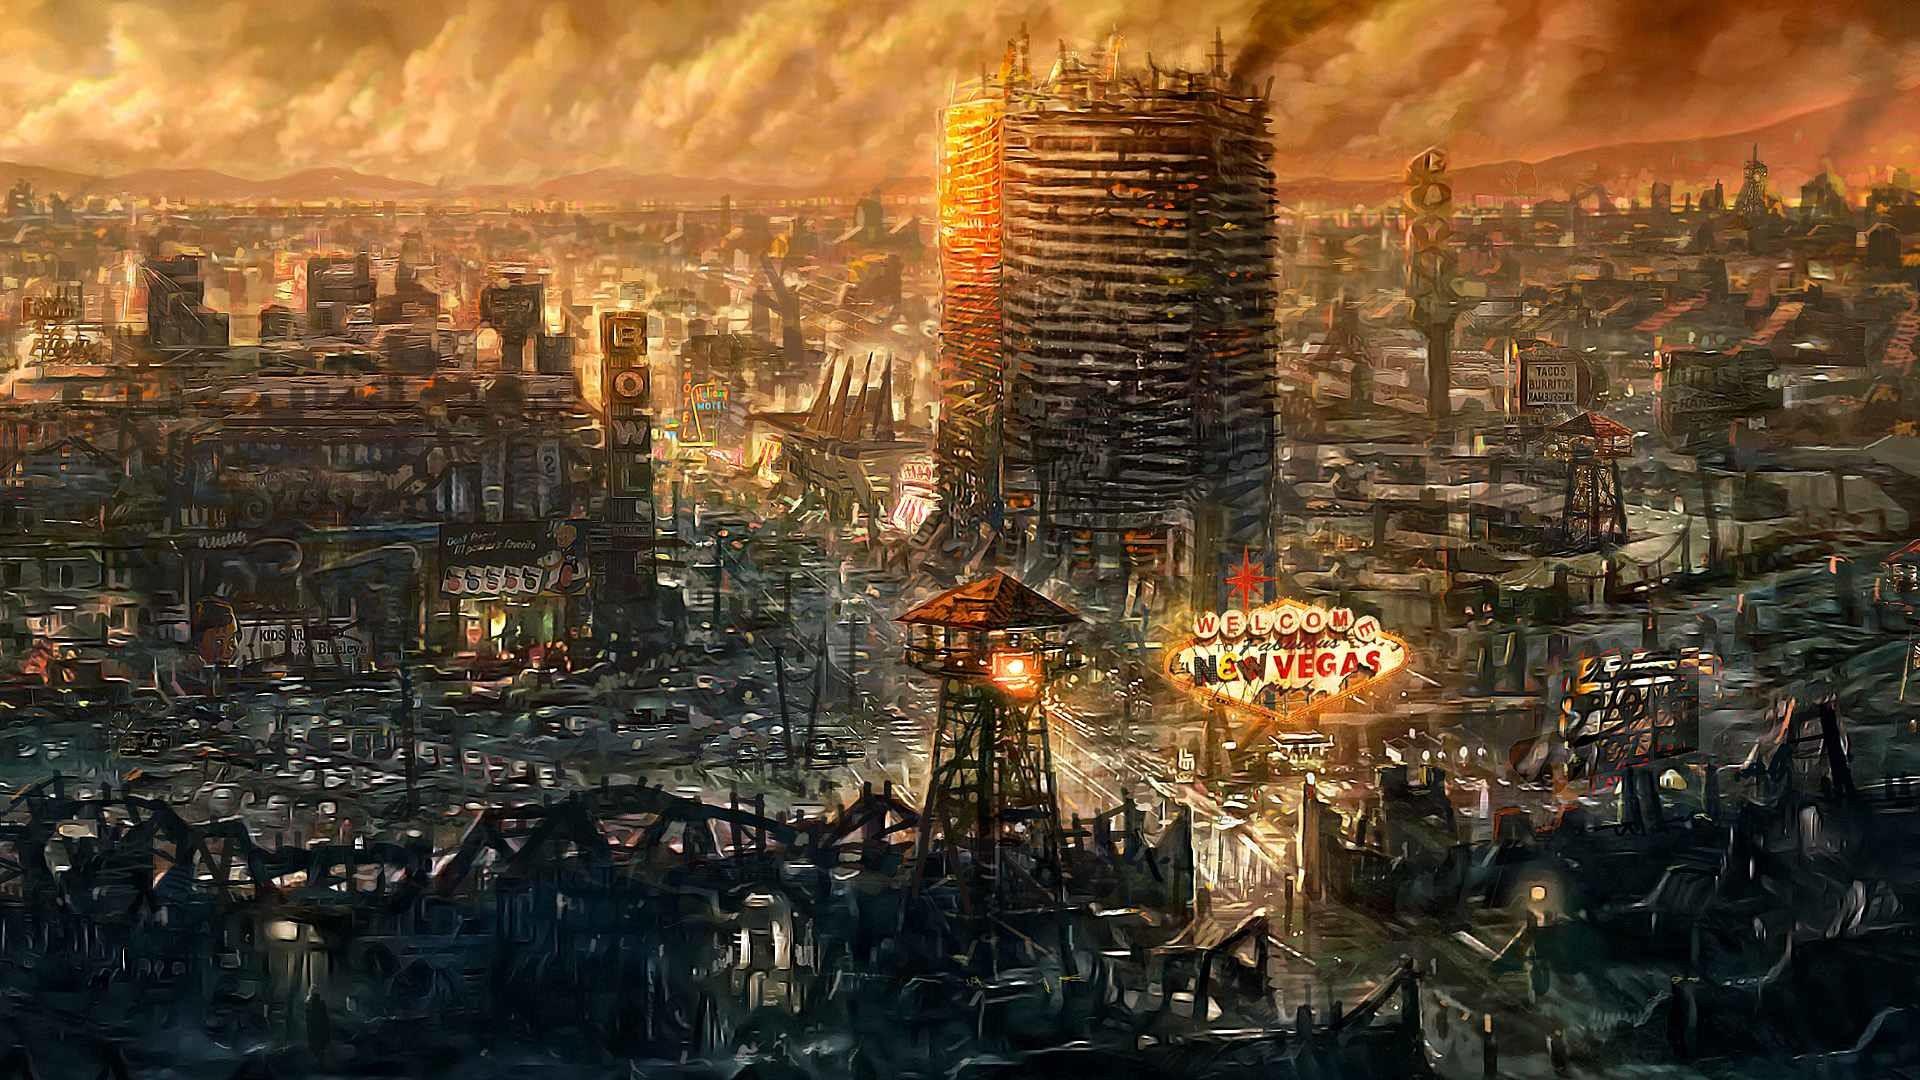 Fallout-4-HD-Wallpaper-20.jpg (1920×1080)